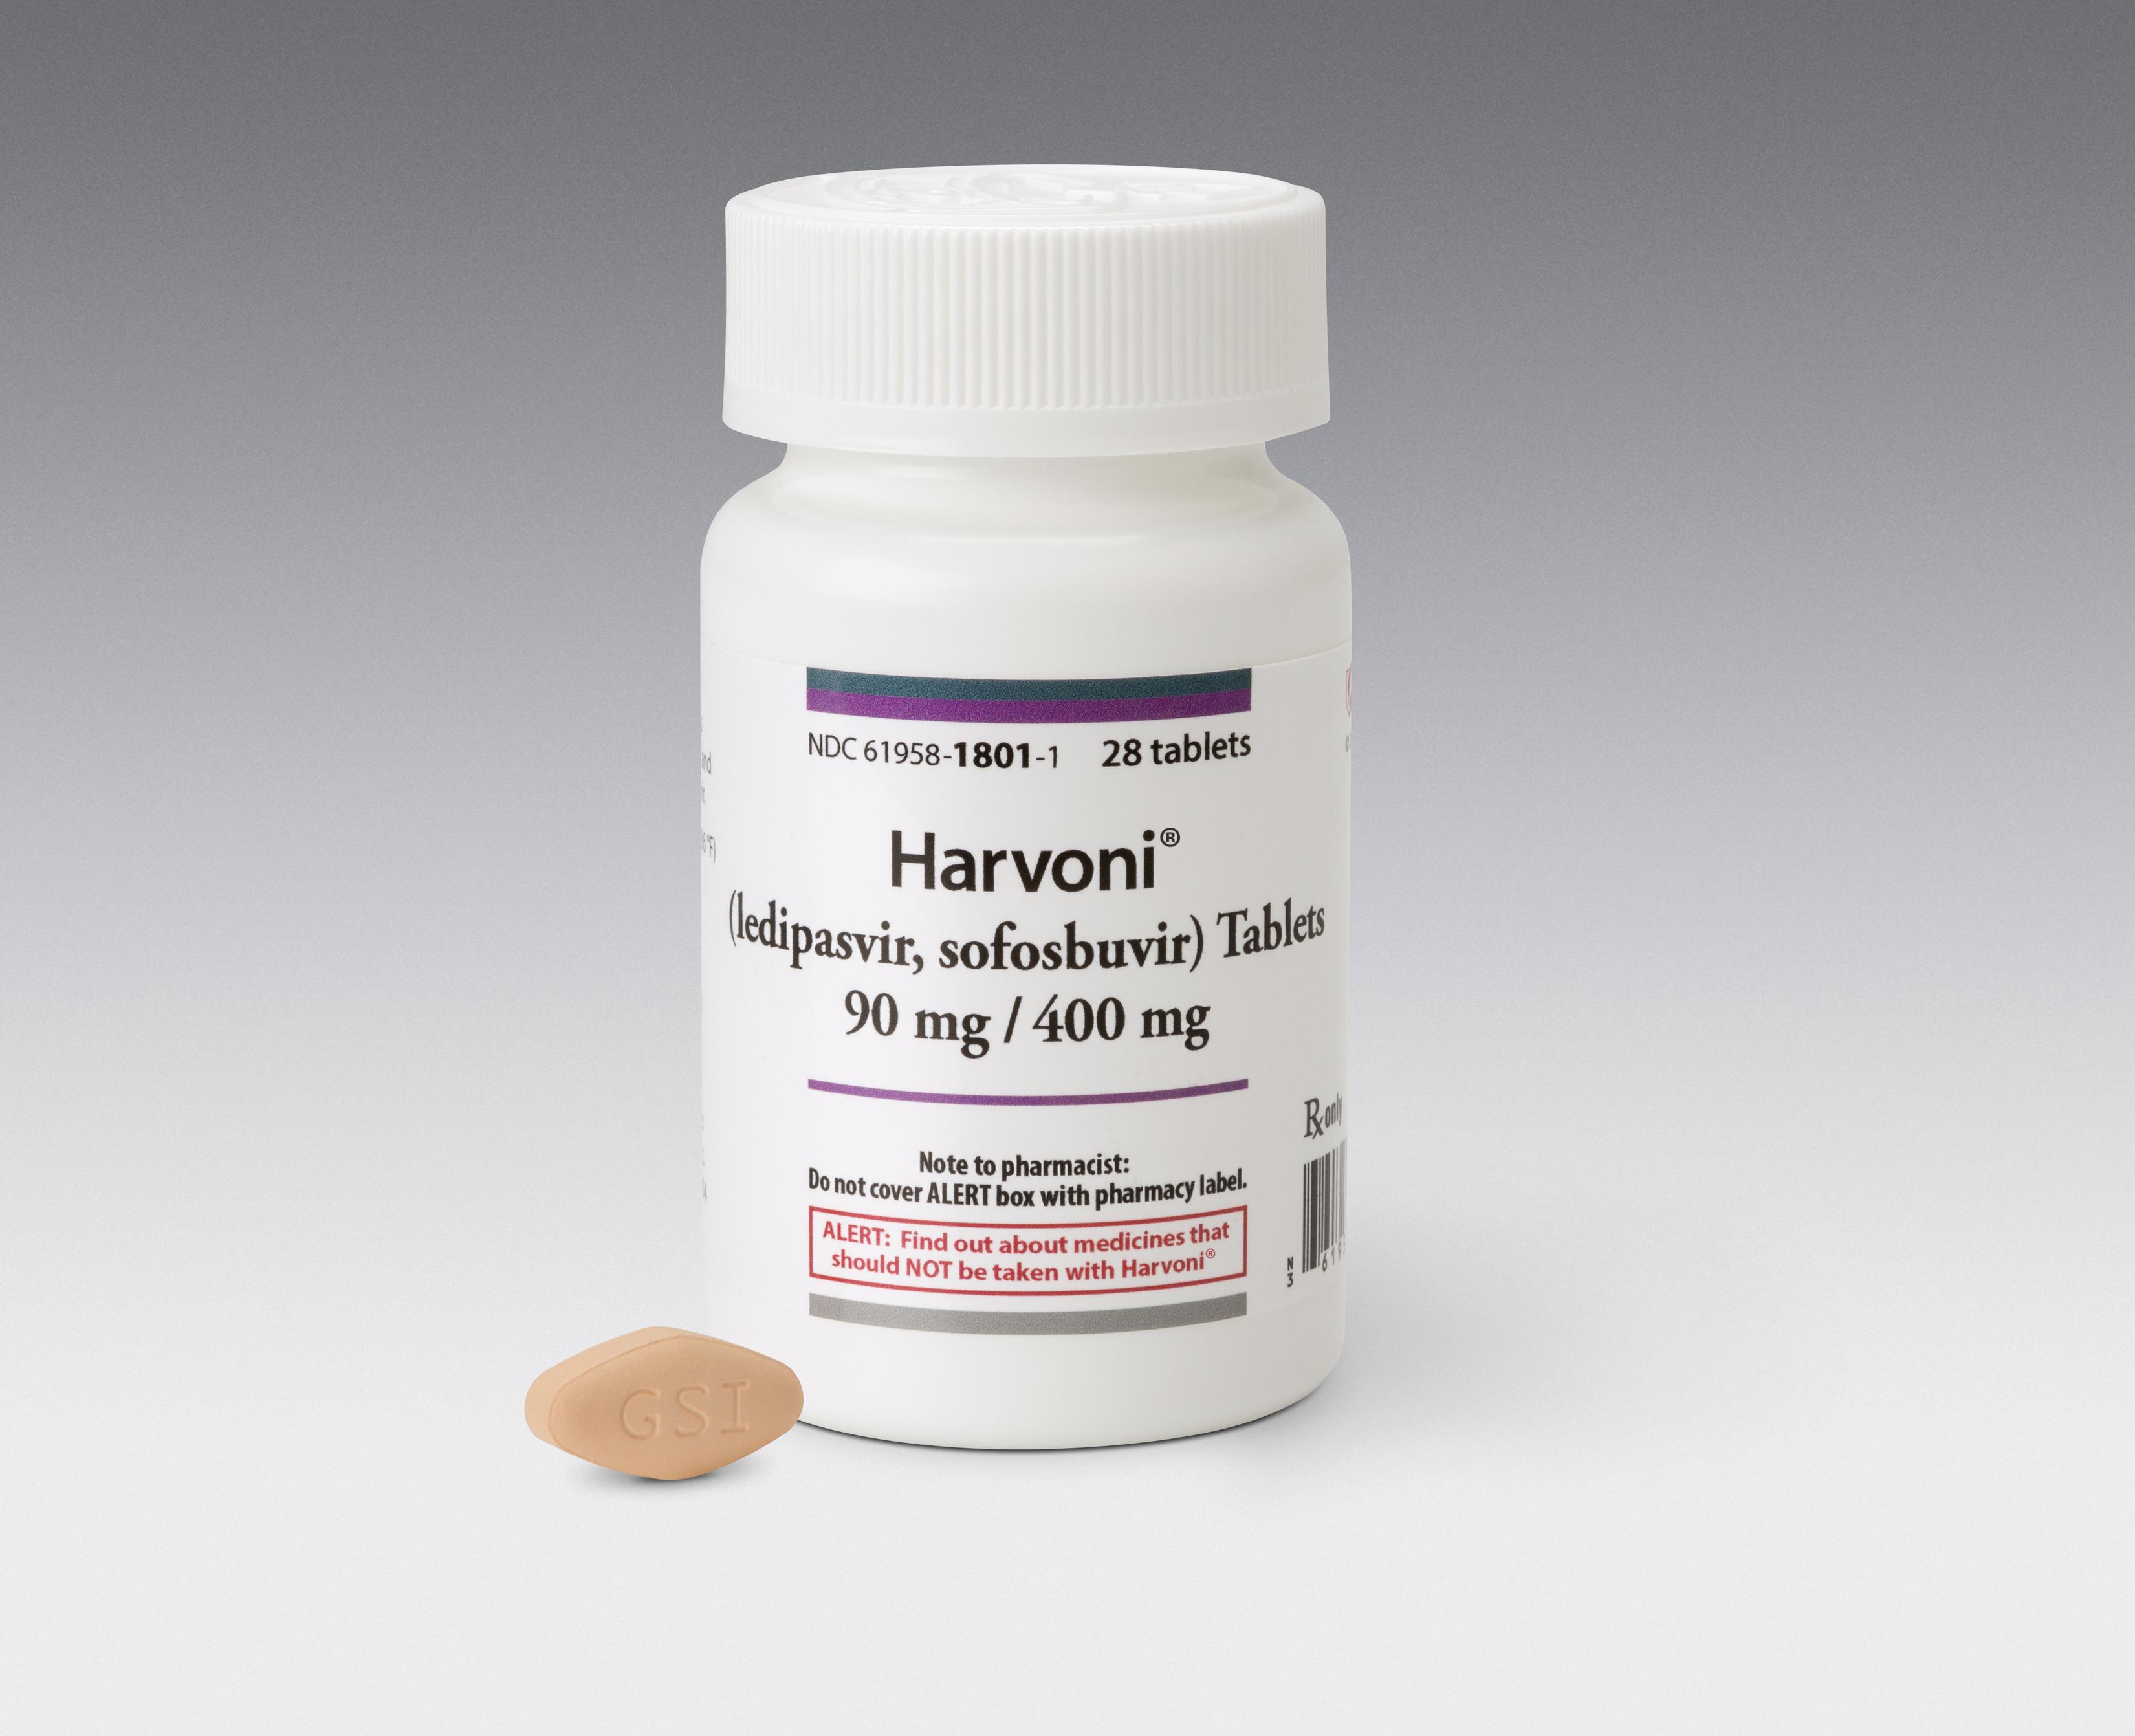 Ribavirin Dosage With Harvoni